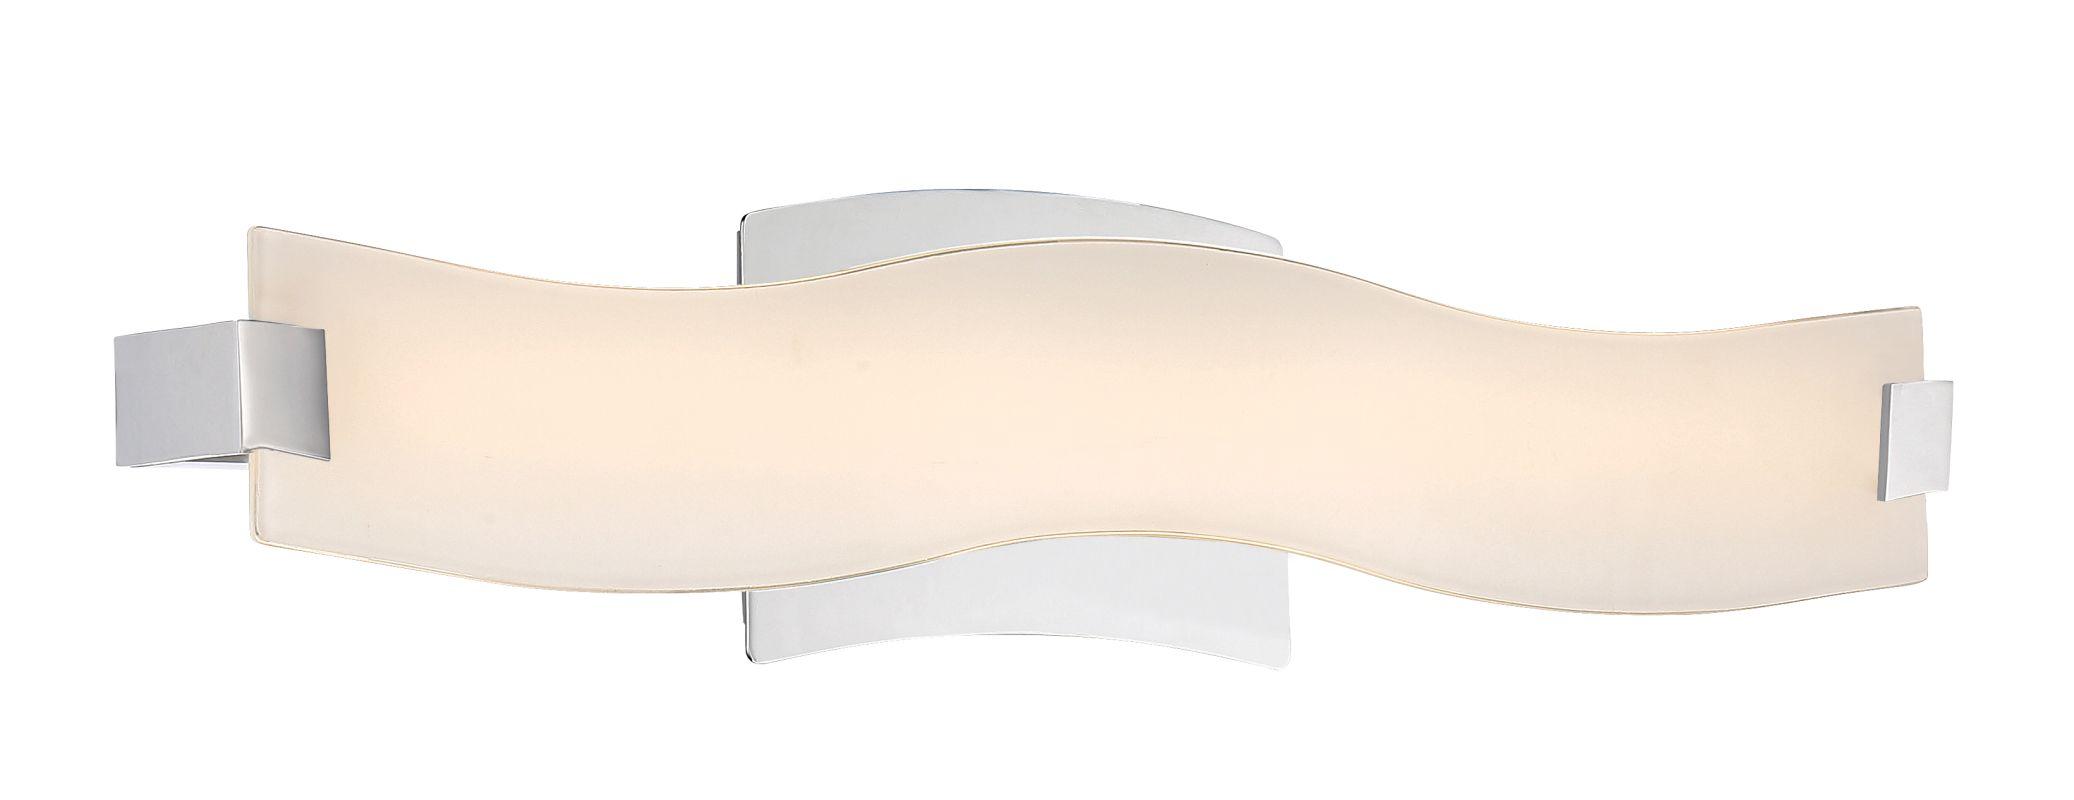 "Platinum PCGD8522 Glider Single Light 22"" Wide LED Bath Bar - ADA Sale $169.99 ITEM#: 3006677 MODEL# :PCGD8522C UPC#: 611728271209 :"